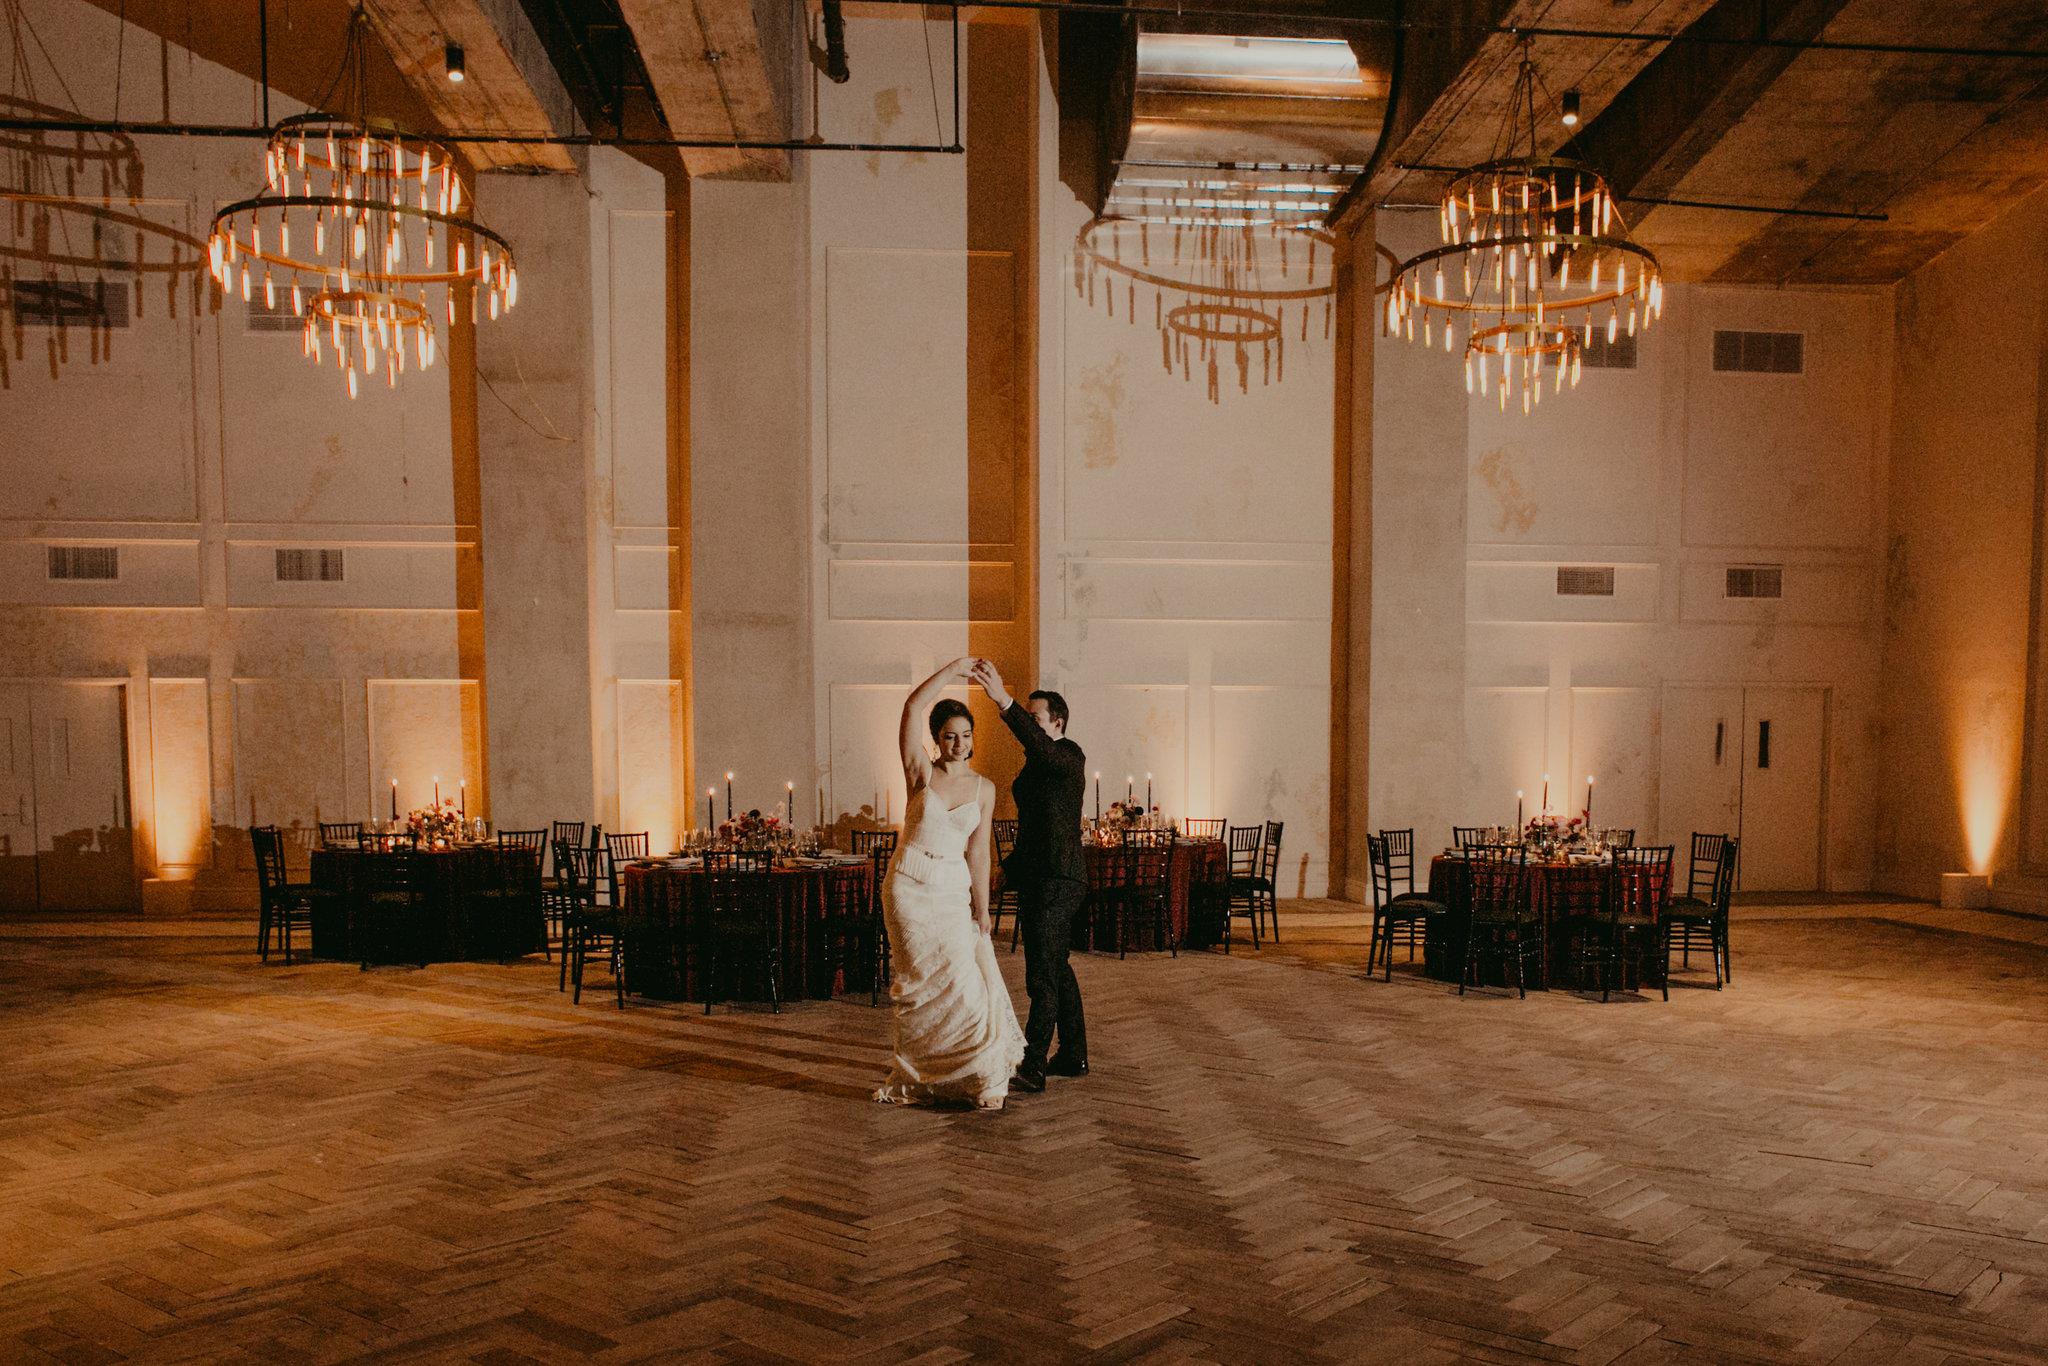 Williamsburg_Hotel_Wedding_Photographer_Chellise_Michael_Photography-236.jpg